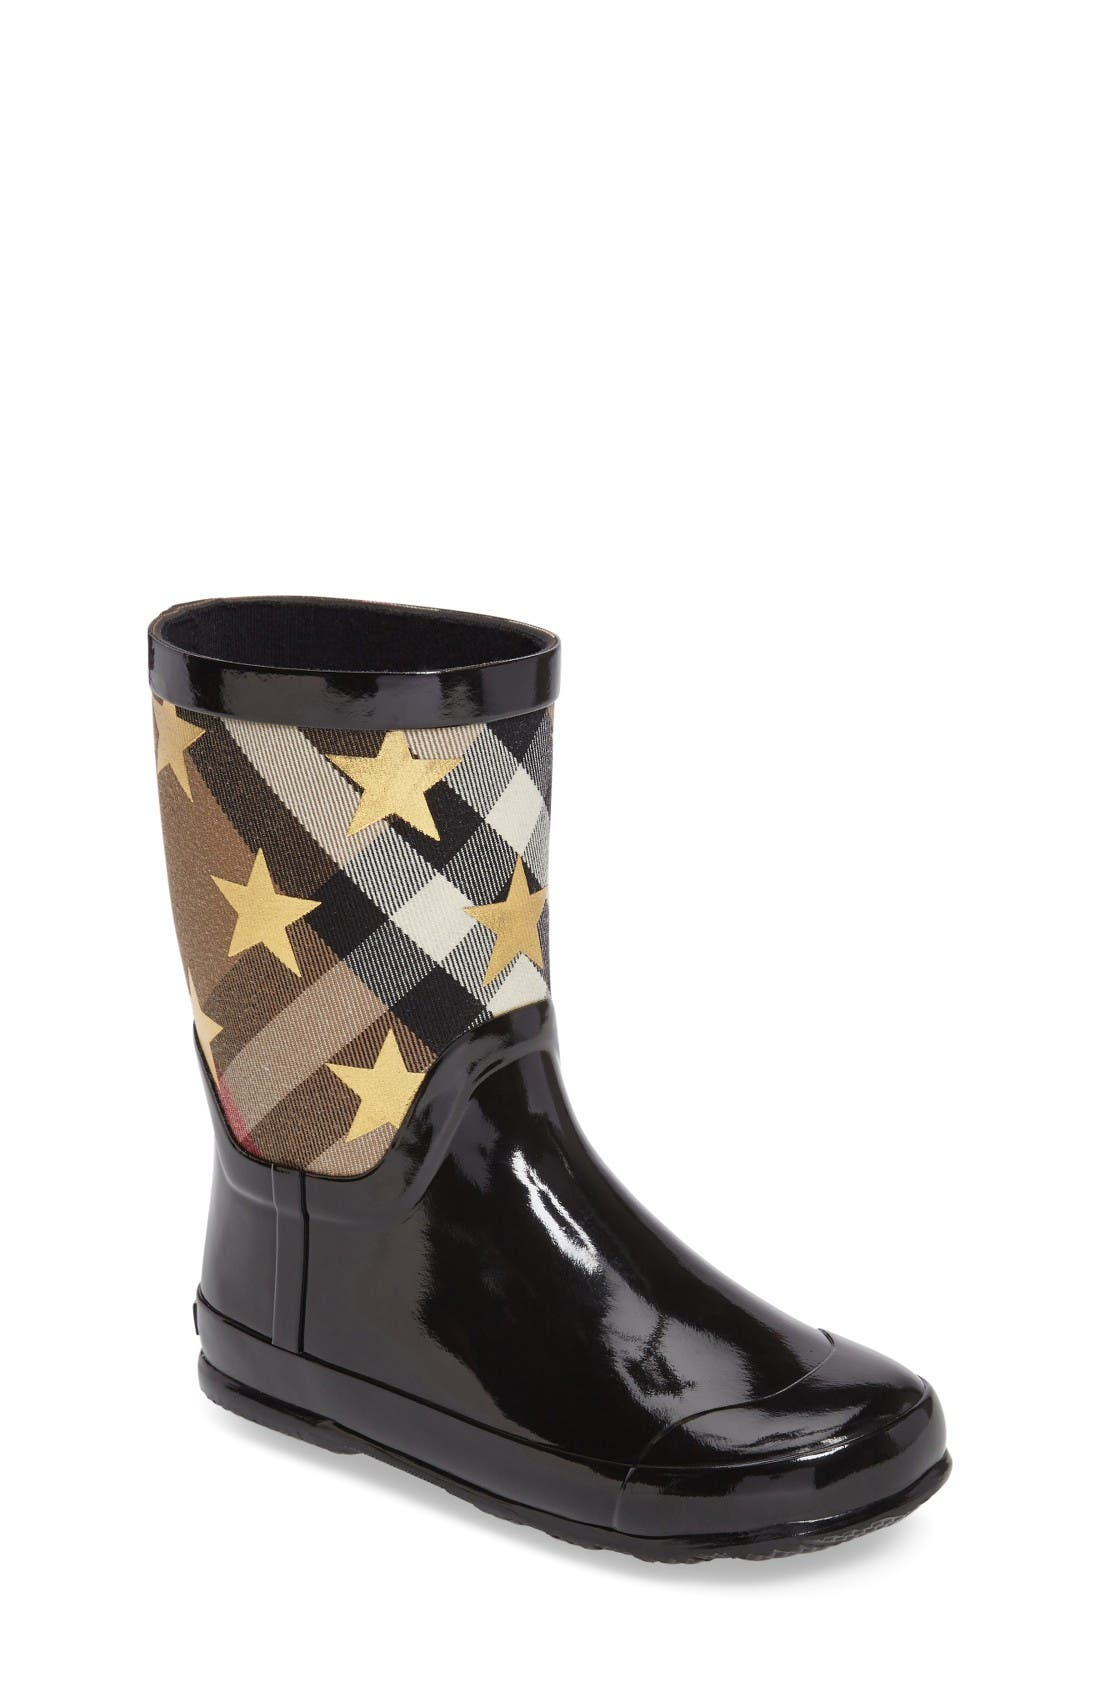 Alternate Image 1 Selected - Burberry Ranmoor Star Rain Boot (Toddler & Little Kid)